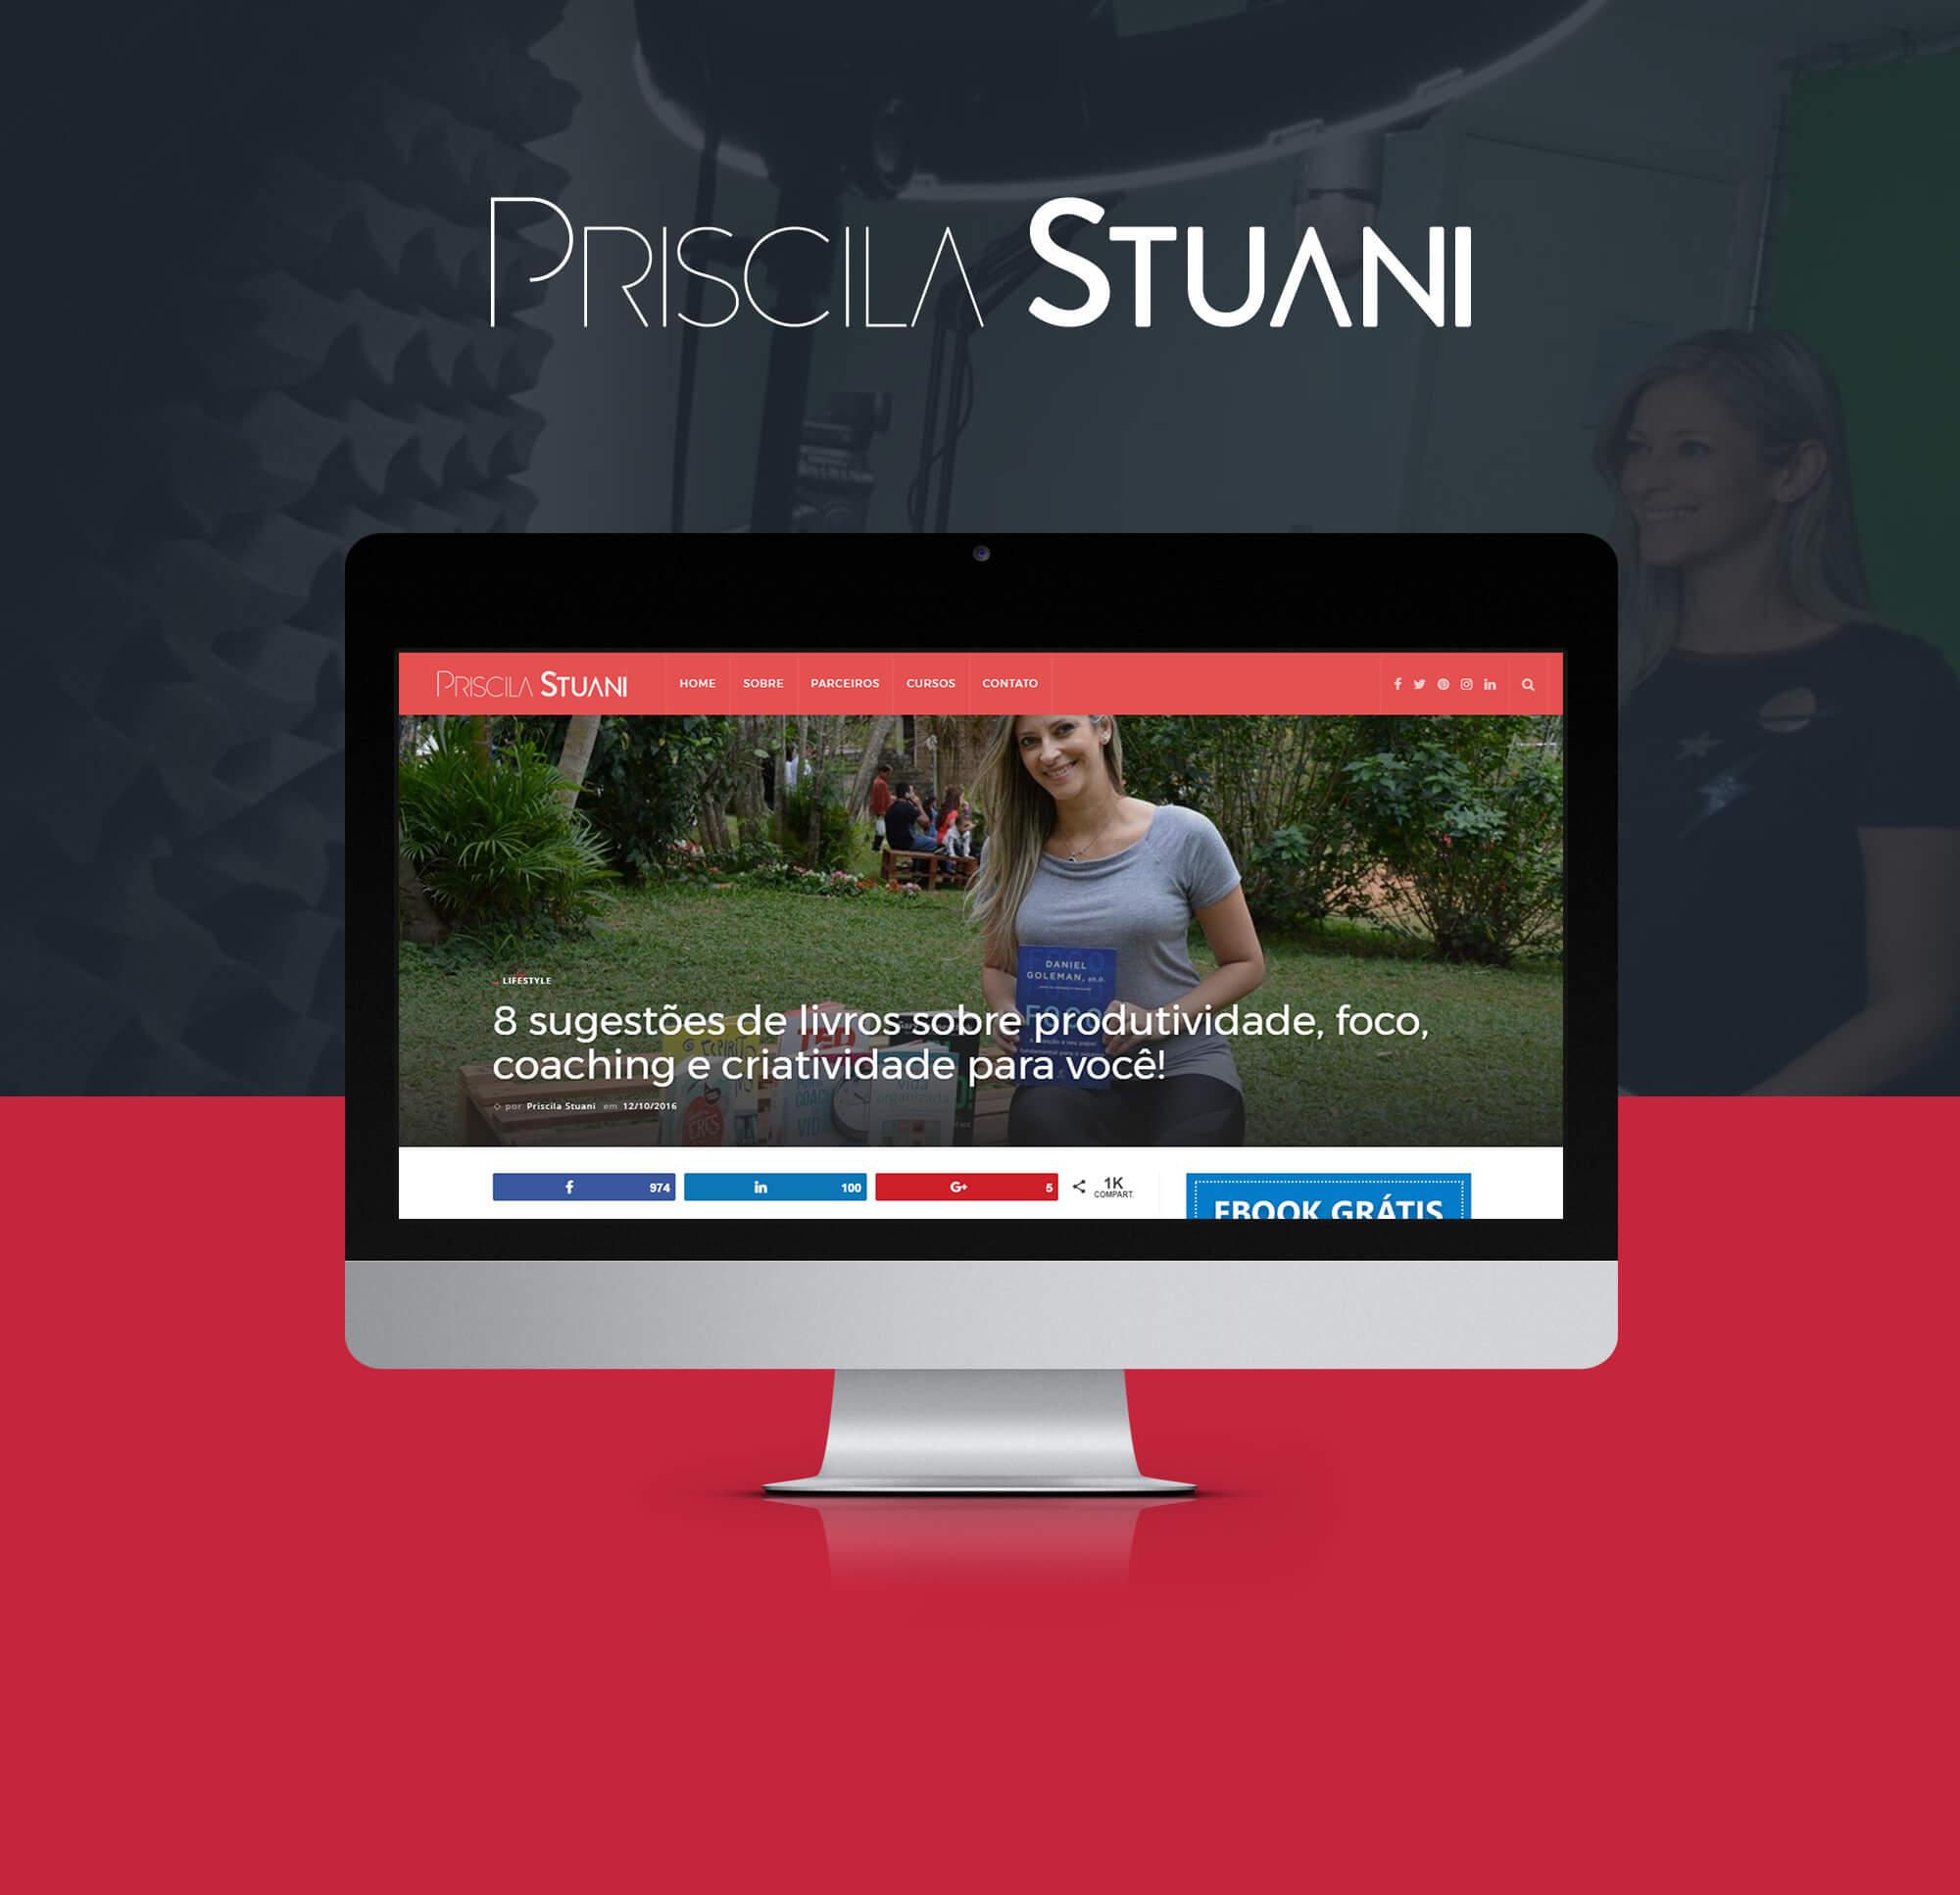 Priscila Stuani - Lifestyle, Personal Branding e Marketing Digital